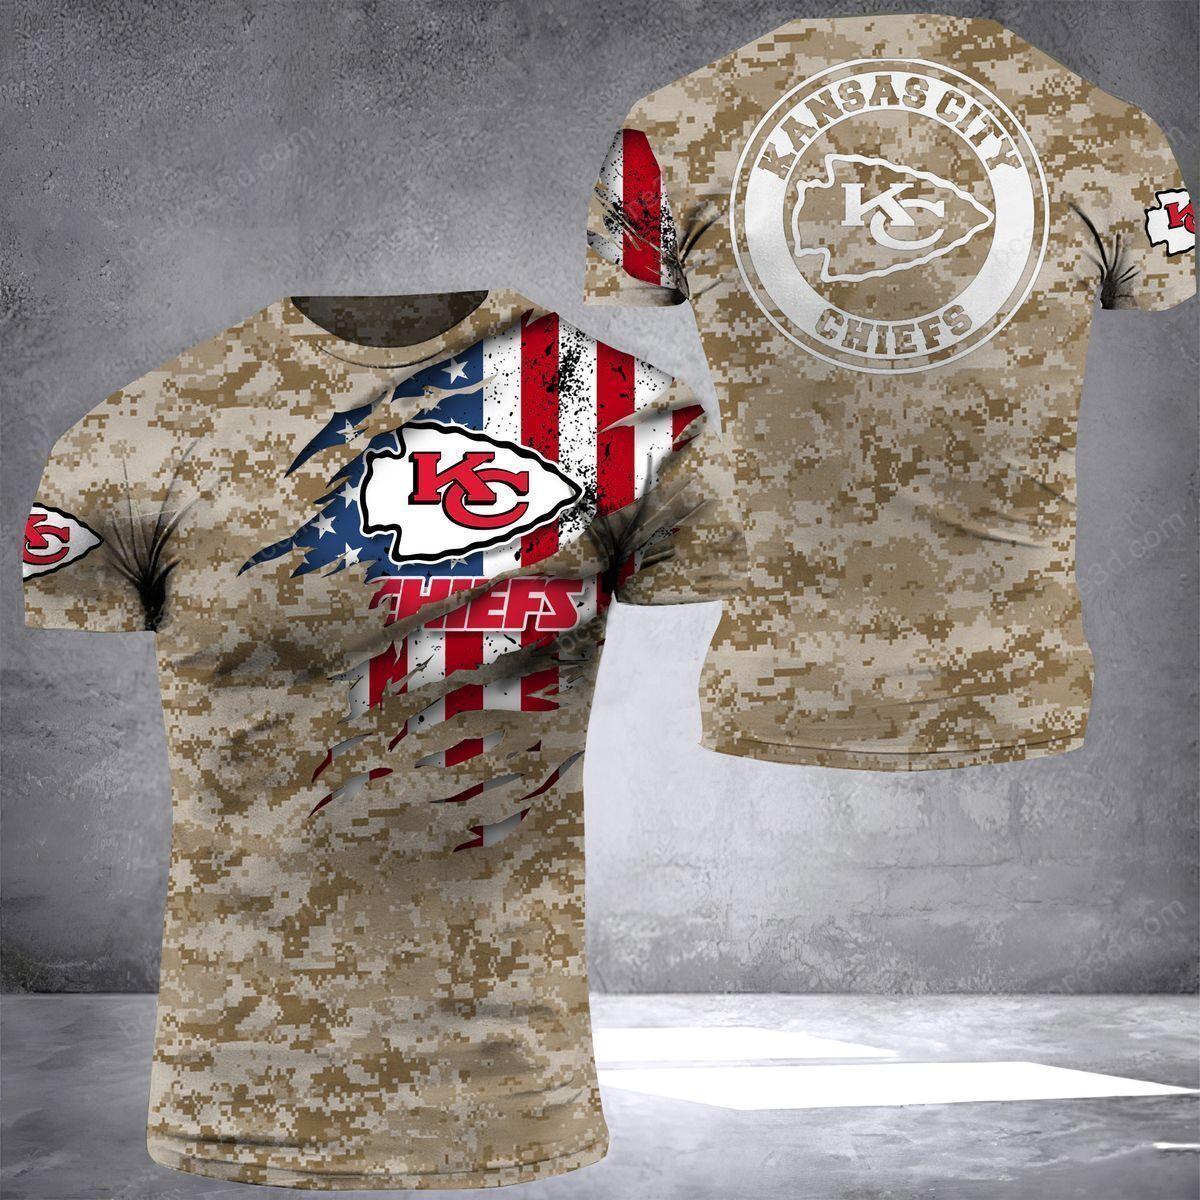 Kansas City Chief US Camouflage T shirt 3D